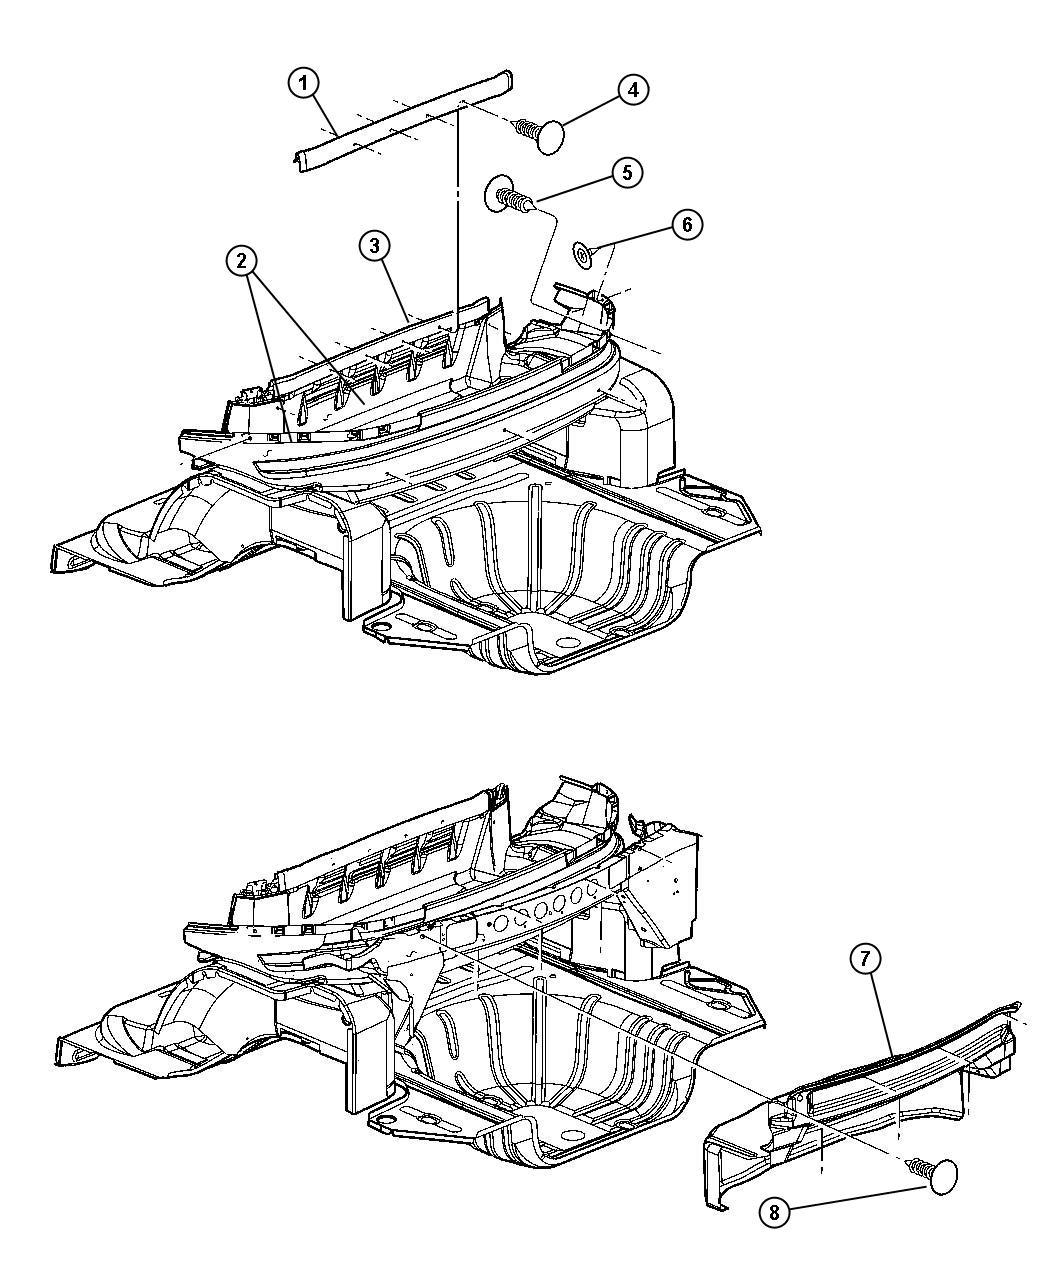 Chrysler Sebring Convertible Limited 2 7l V6 Dohc 24 Valve Mpi 4 Speed Automatic Shelf Cargo